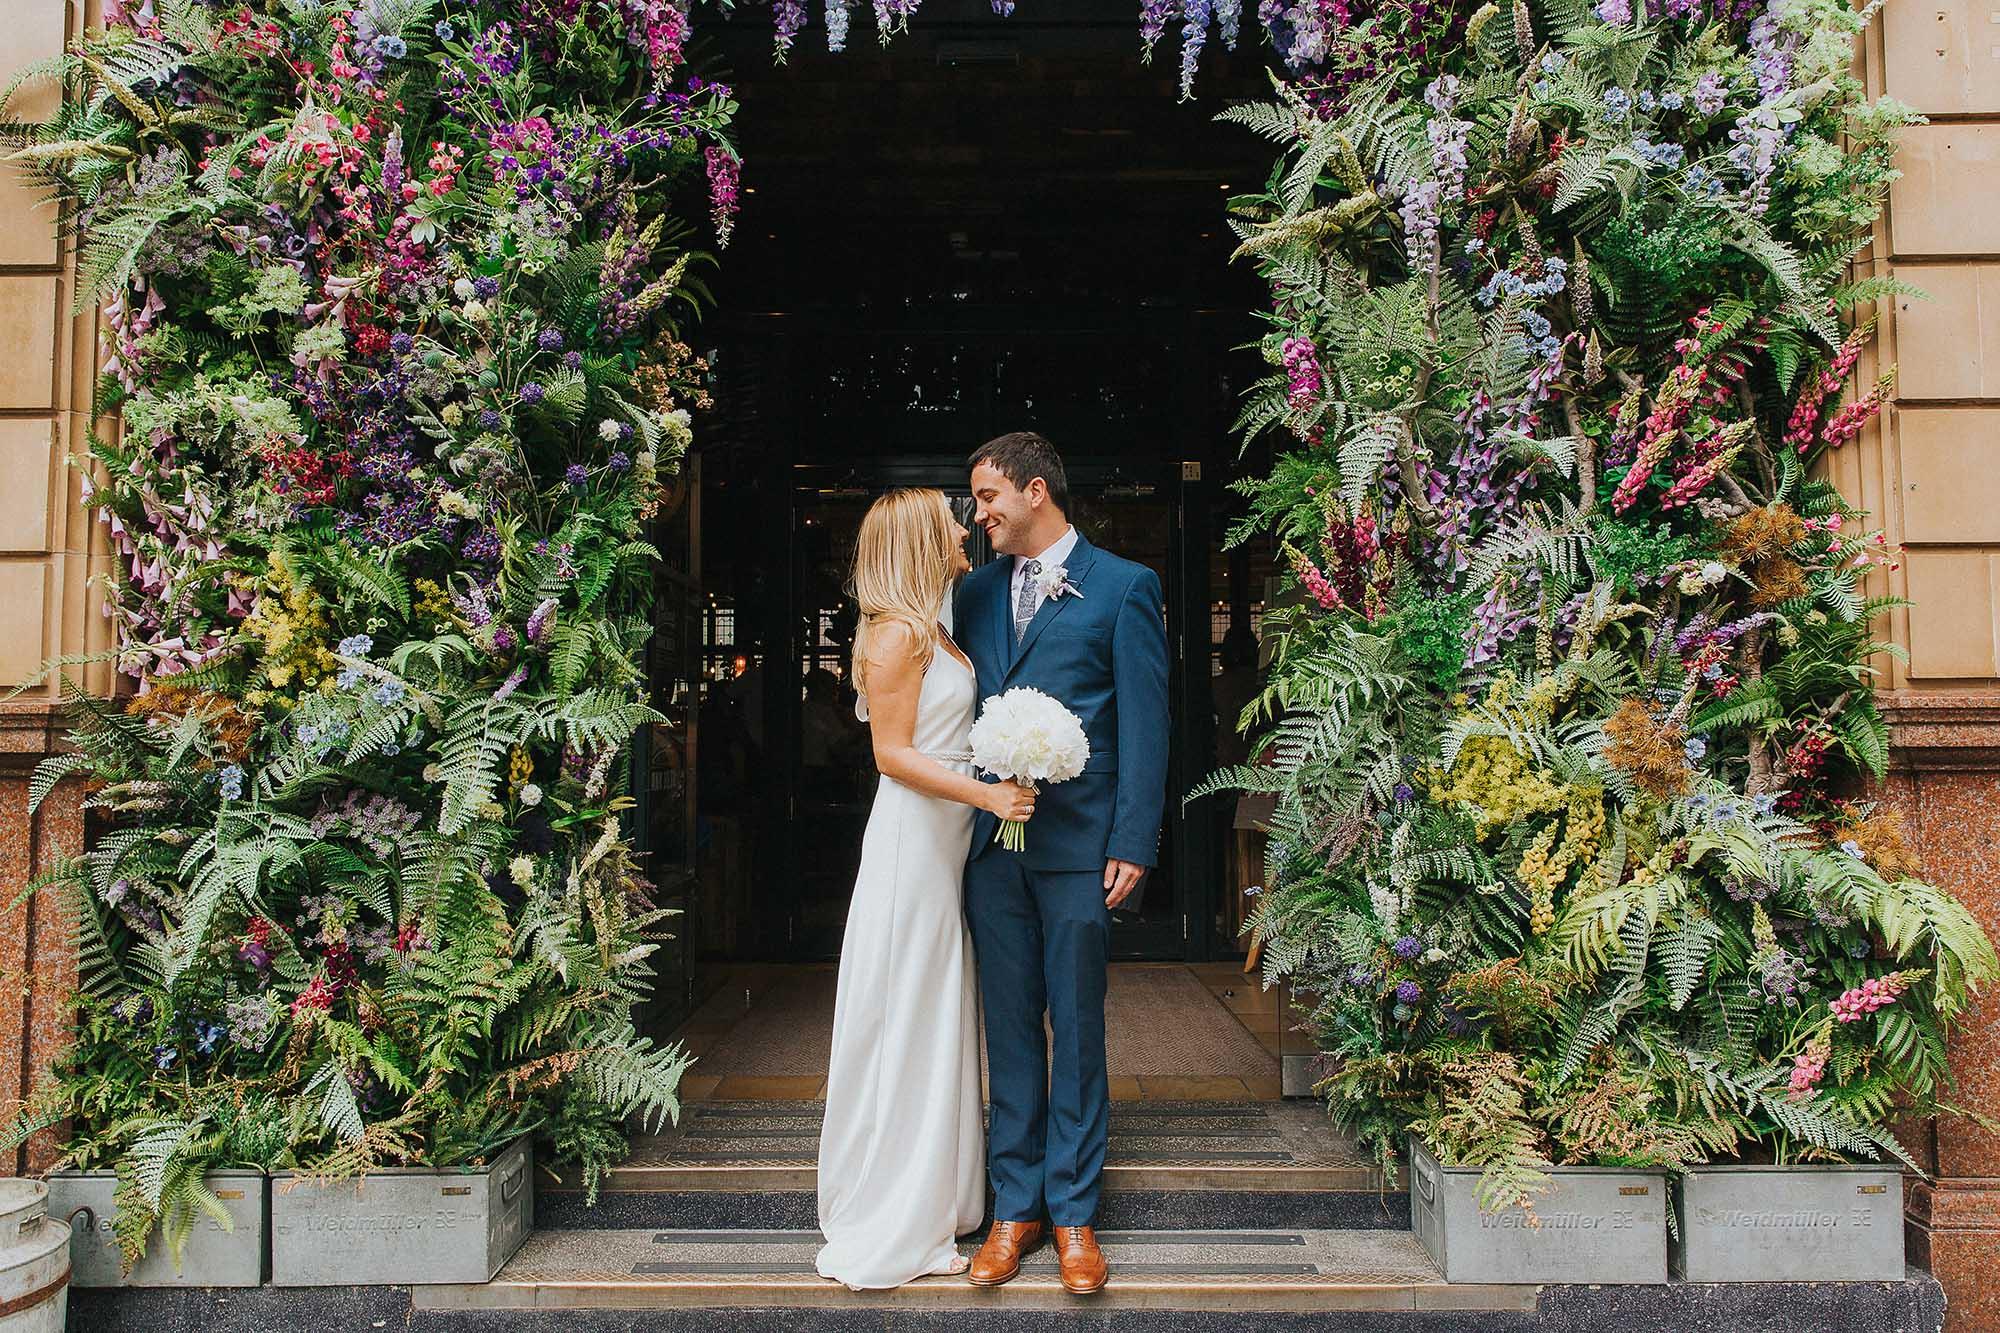 Albert Hall wedding photographer Manchester